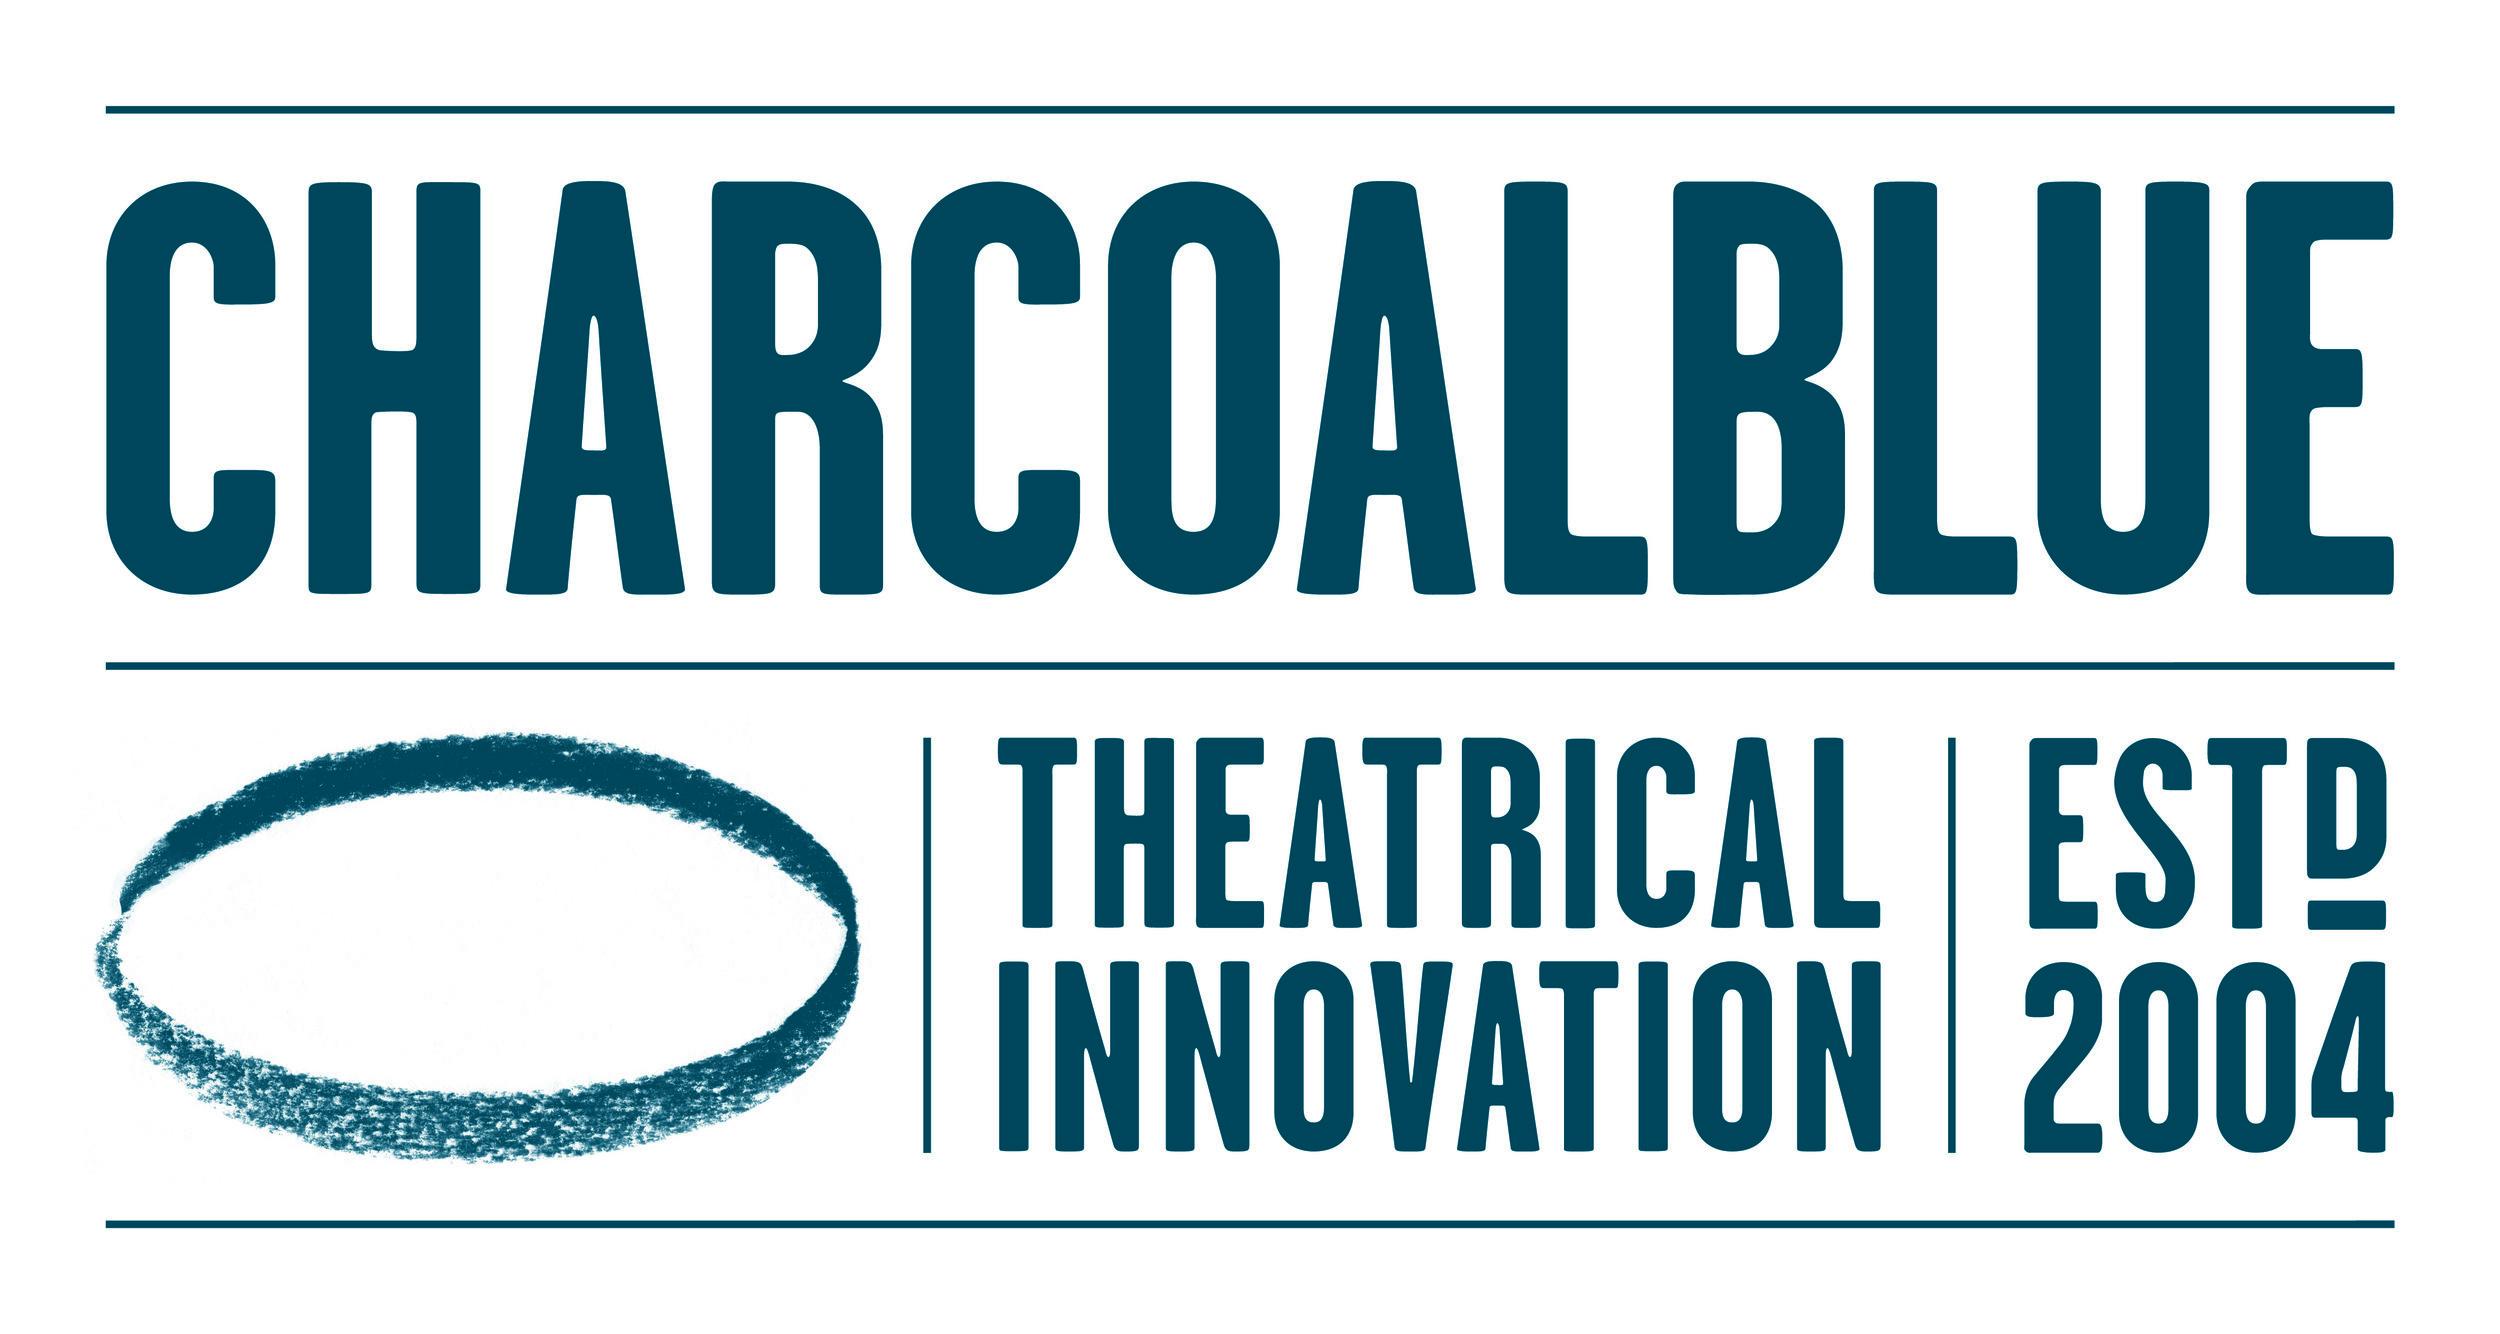 Charcoalblue, Theatre Designer